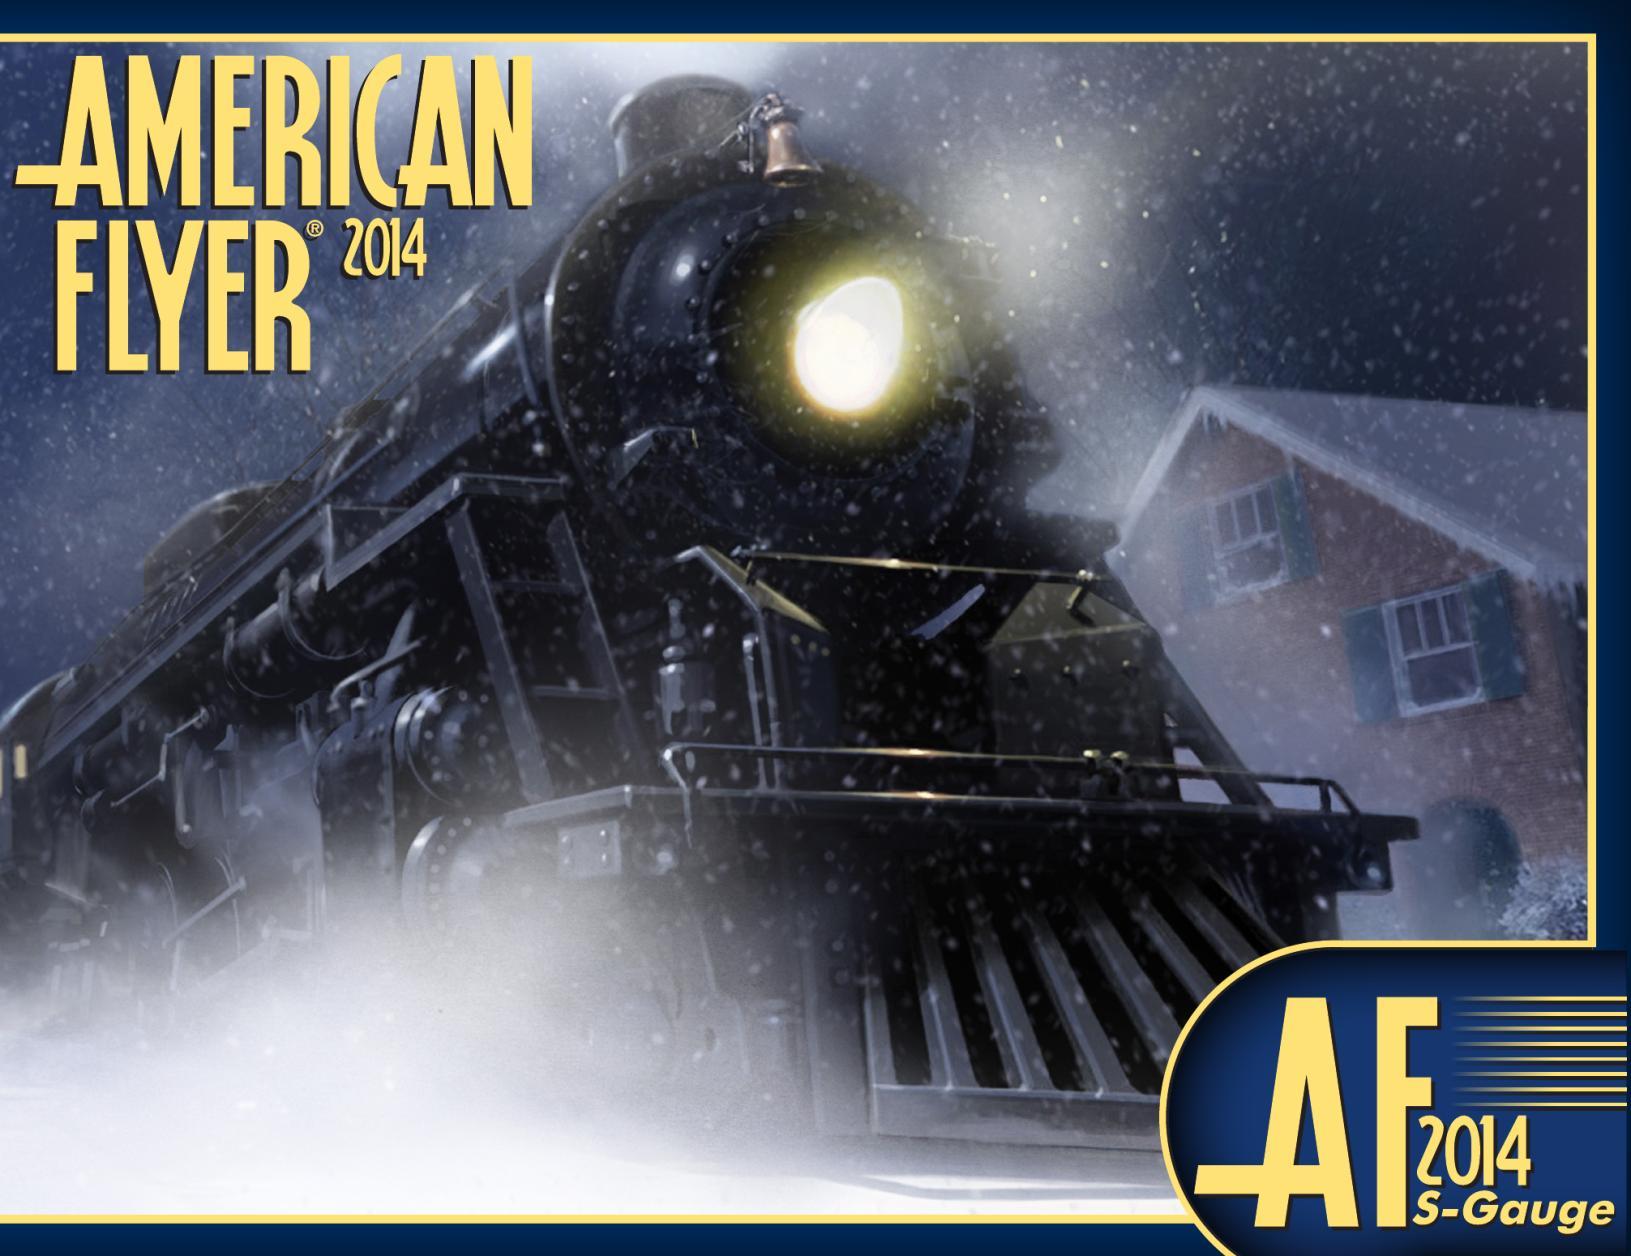 Lionel Catalogs - American Flyer 2014